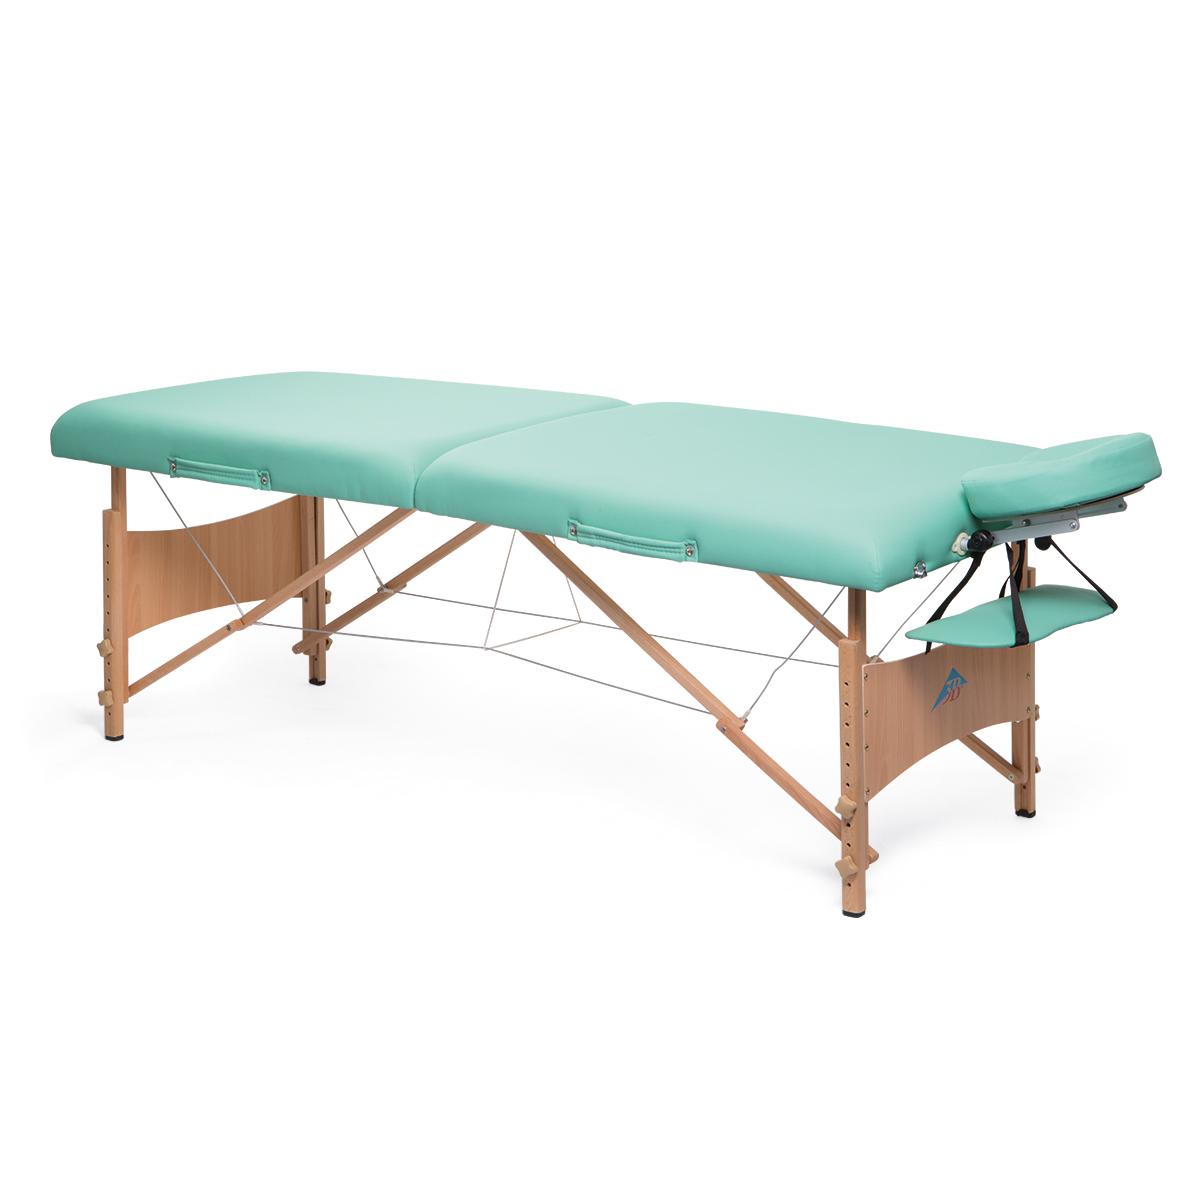 Table de massage portable de luxe vert 1013728 w60613 tables de massage 3b scientific - Table de massage portable ...